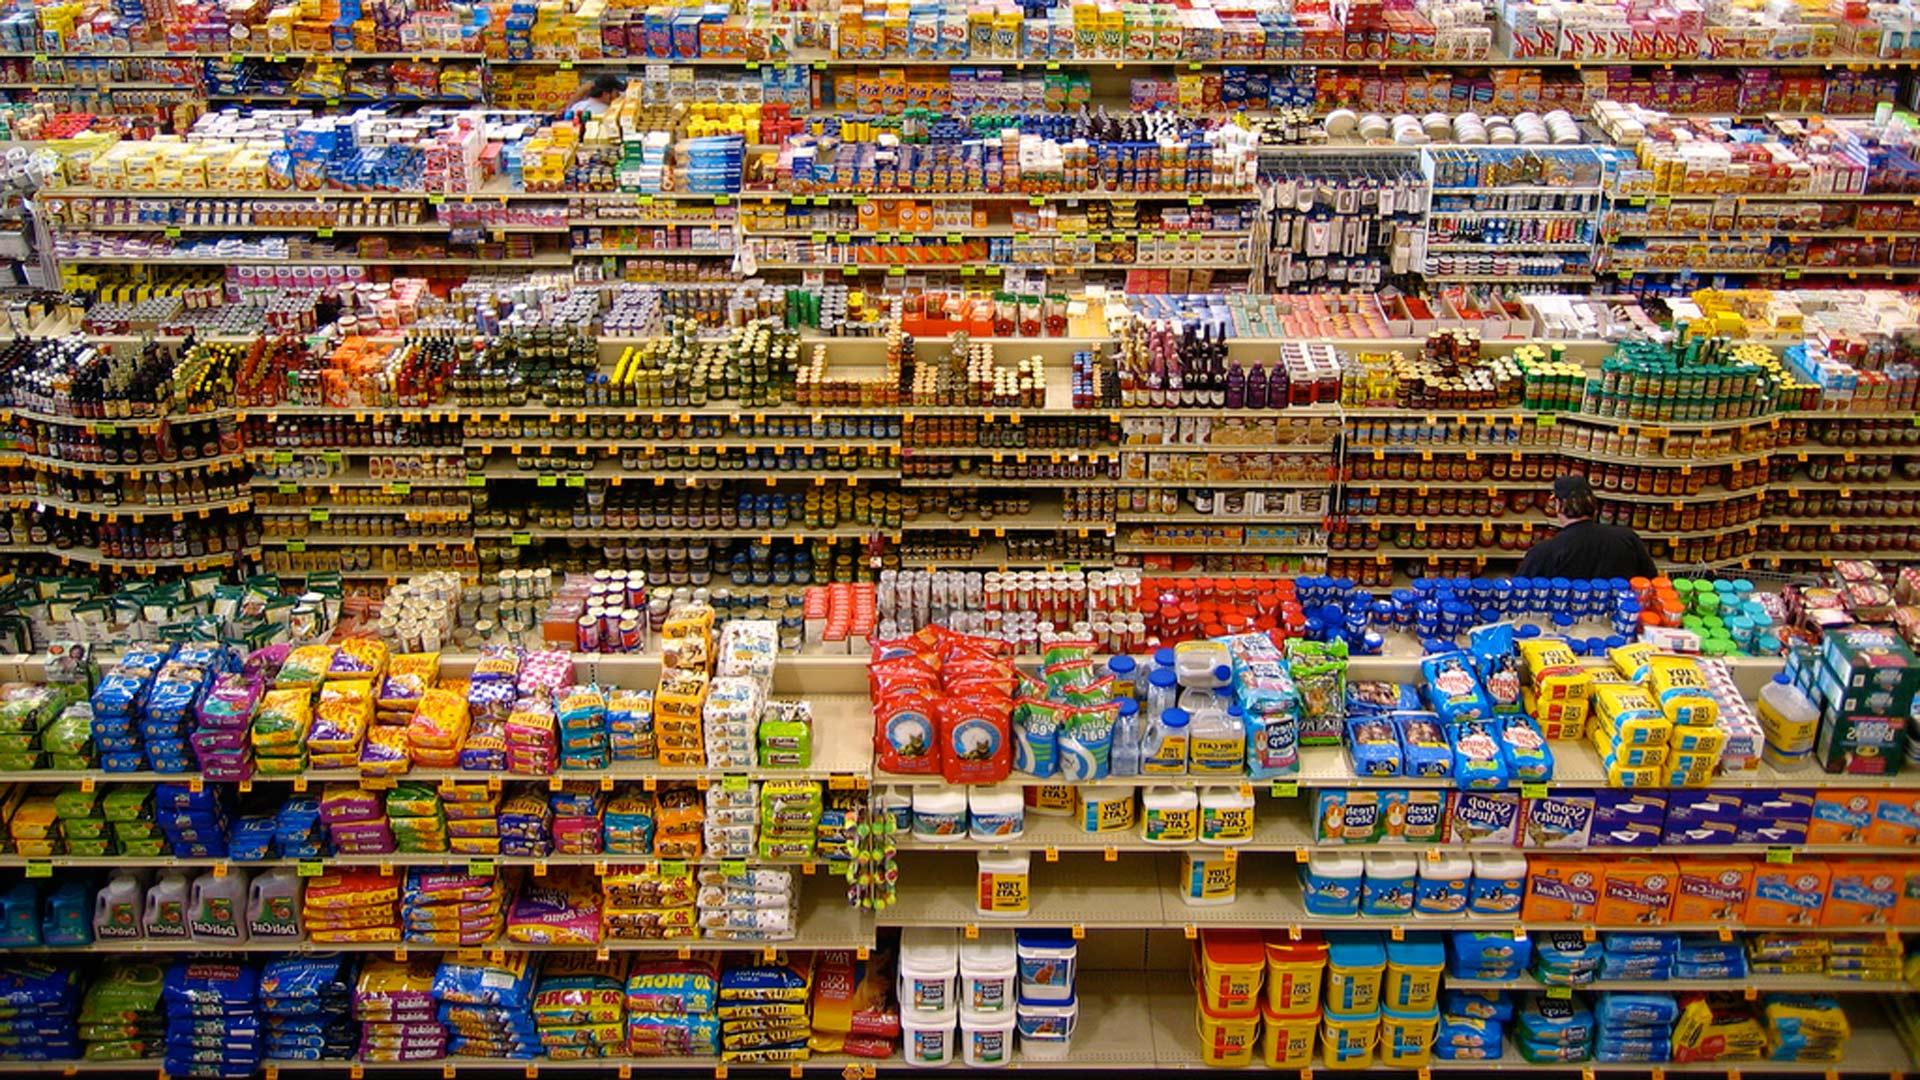 045_supermarket.jpg